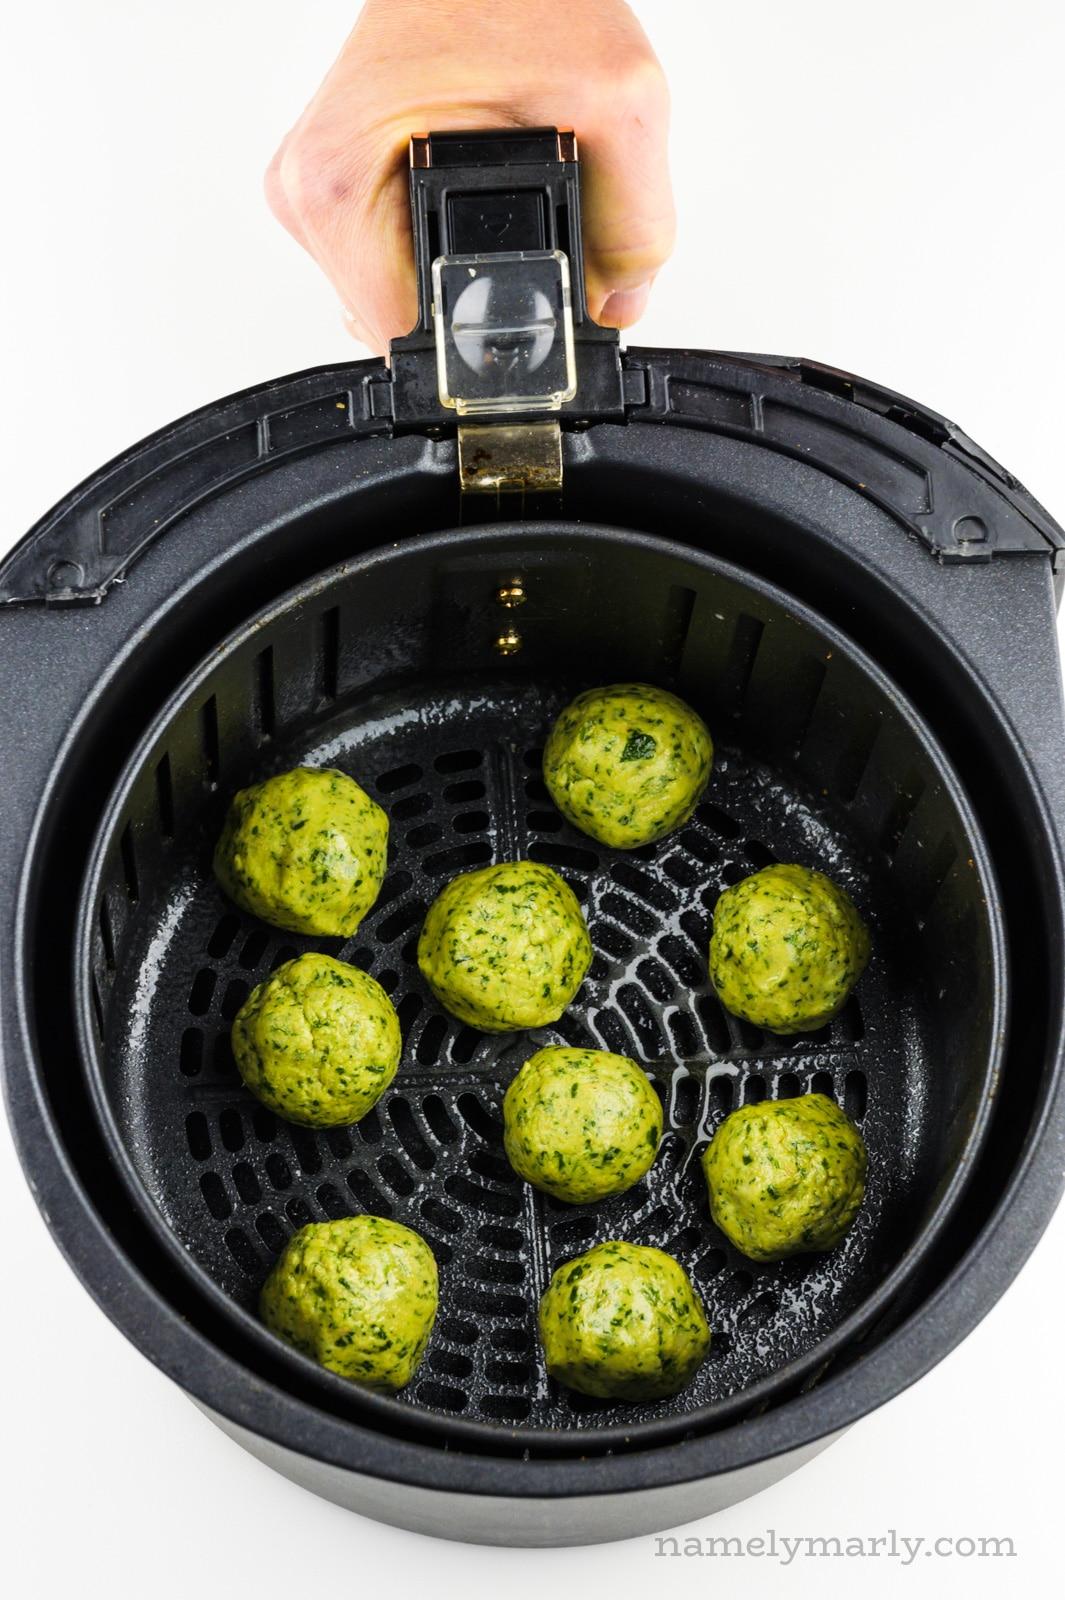 Falafel balls are in an air fryer basket.